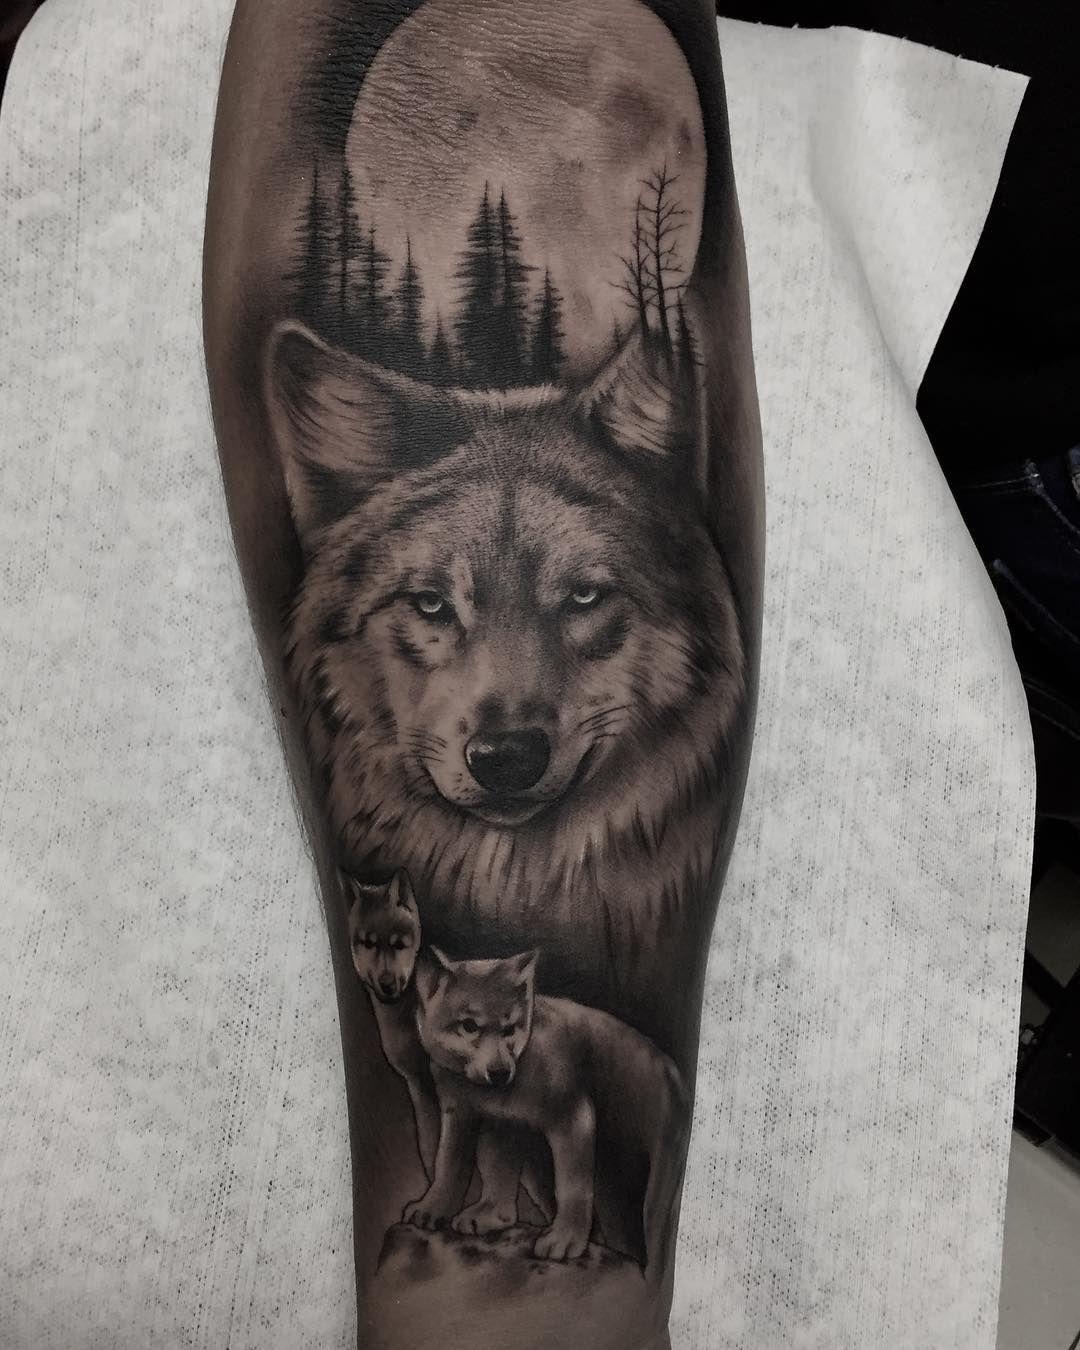 Estamos En Fuego Cbrrrn Proximamente Medellin Bigbrothersupplytattoo Bigbrother Tattoostudio Realisti Wolf Tattoo Sleeve Wolf Tattoos Men Wolf Tattoos